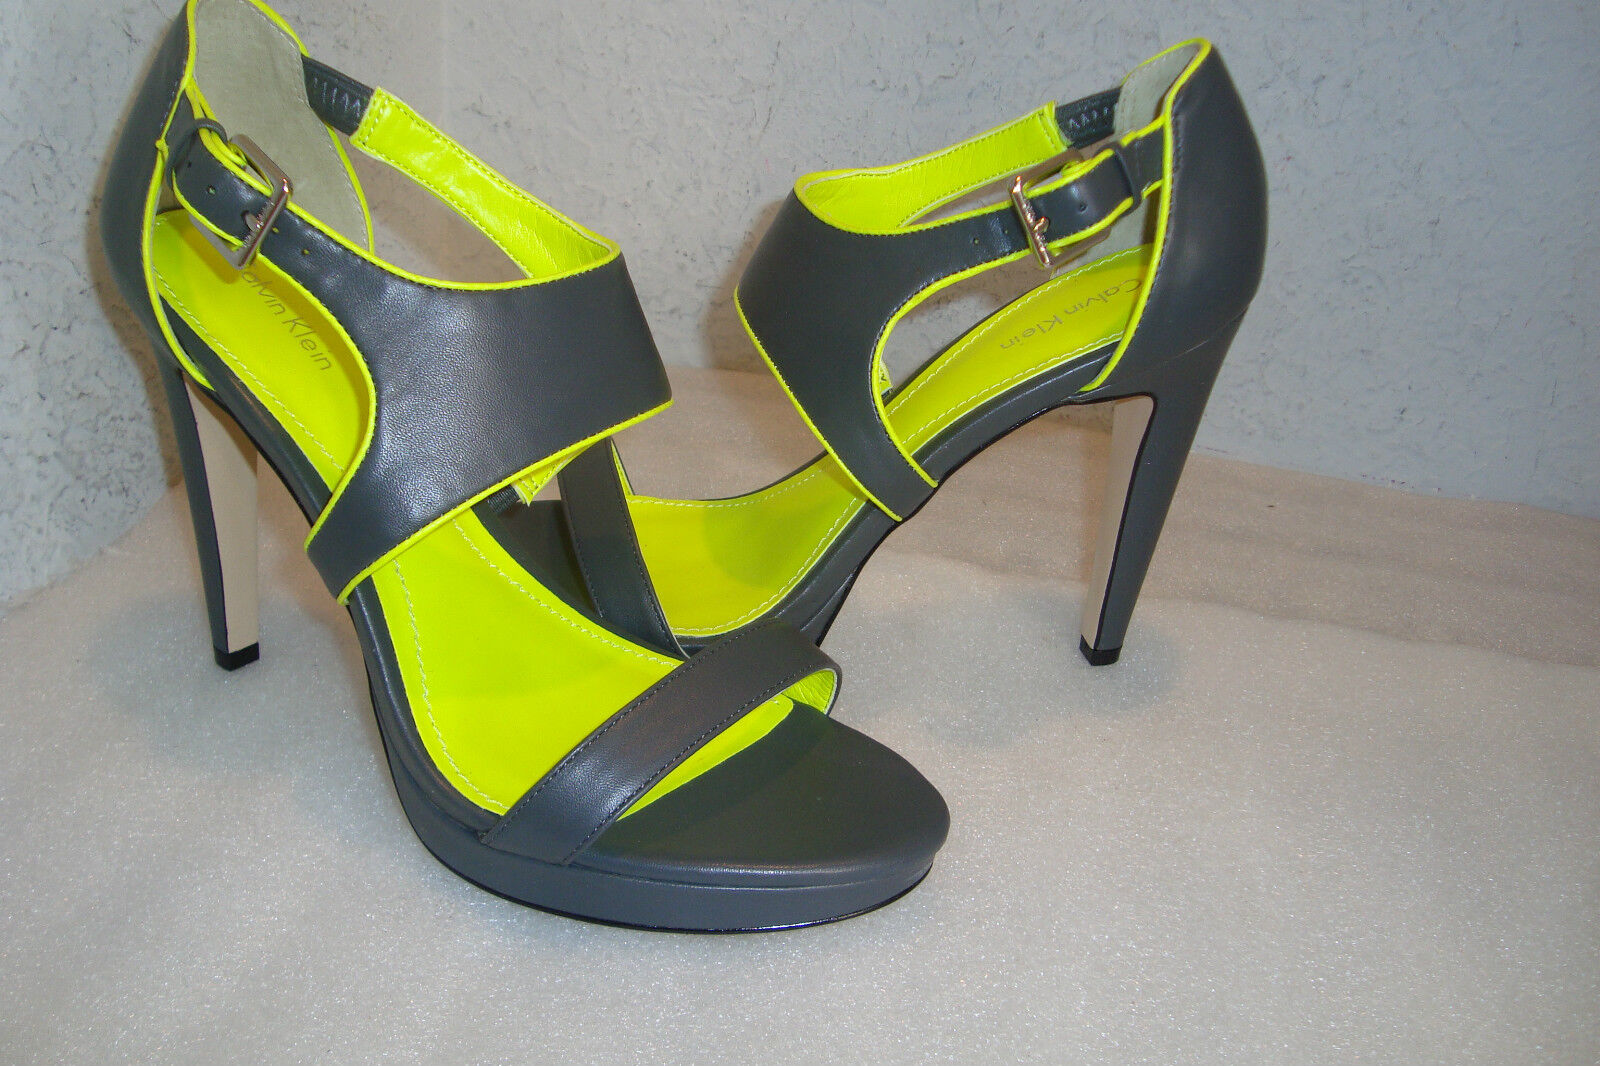 Calvin Klein Damenschuhe NWOB Leahanna Gray Lime Green Sandale Schuhes 8.5 MED NEW